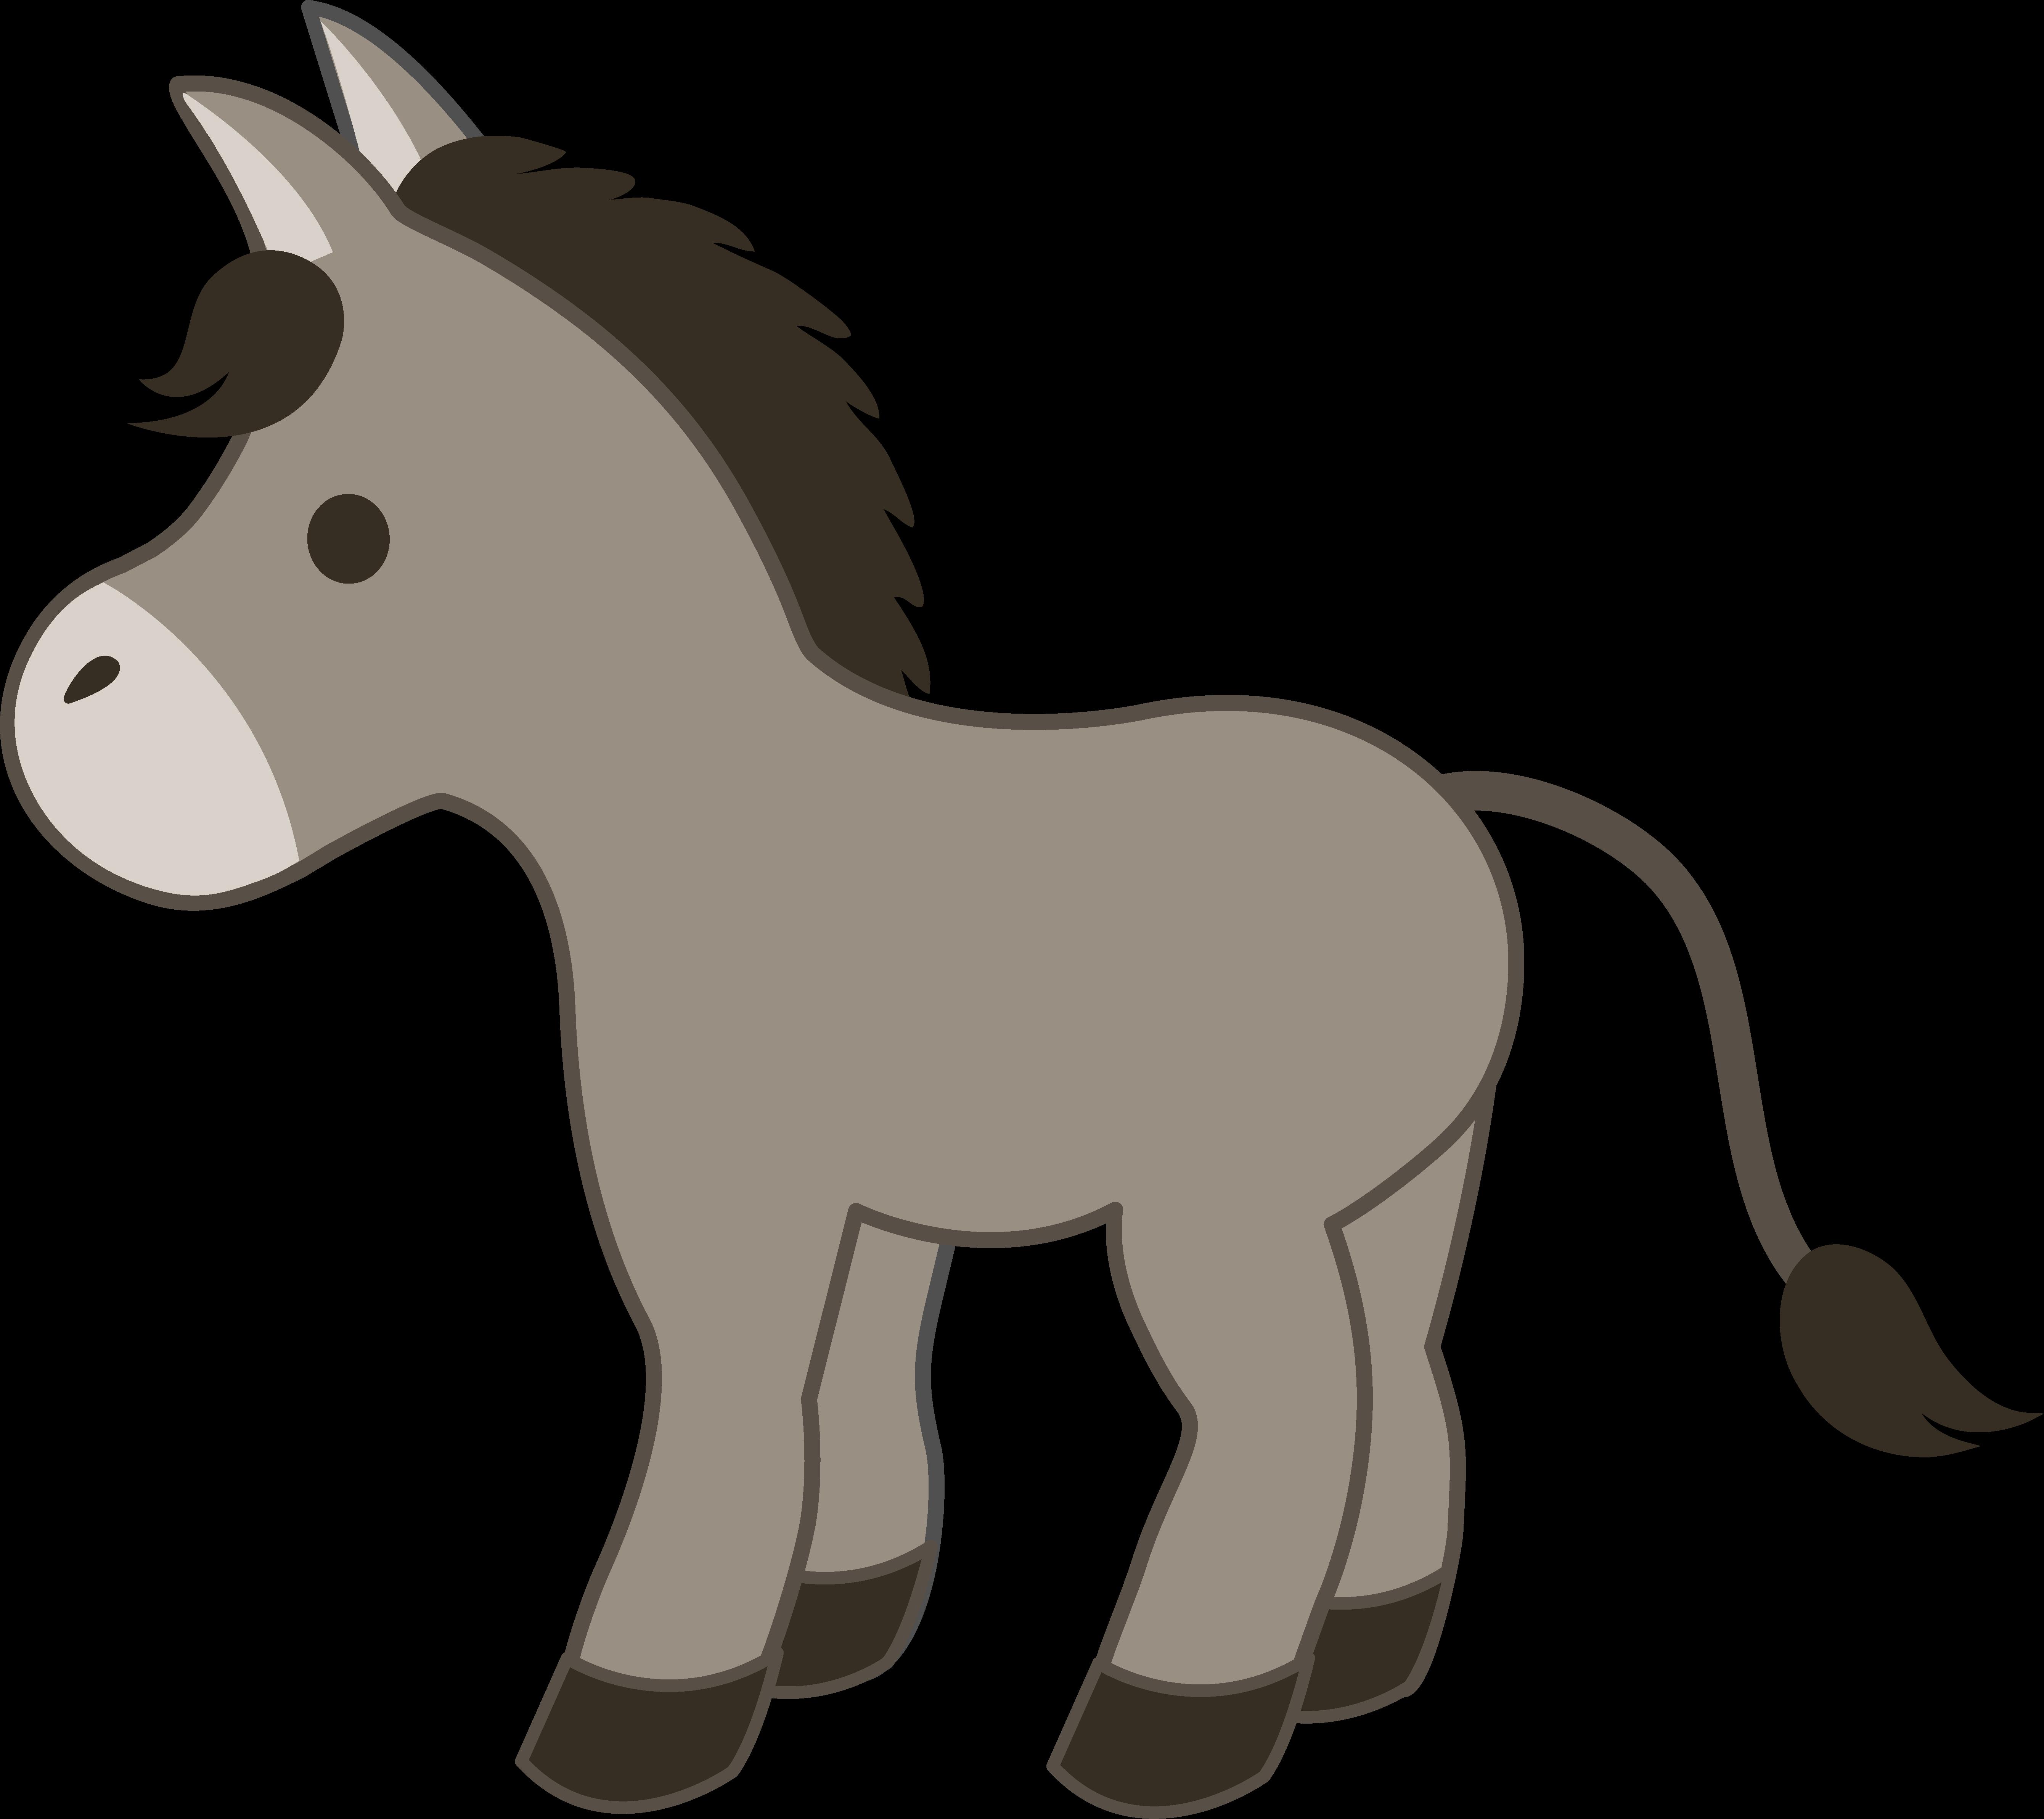 Baby donkey animals clipart clip royalty free library Baby Donkey Cliparts - Cliparts Zone clip royalty free library